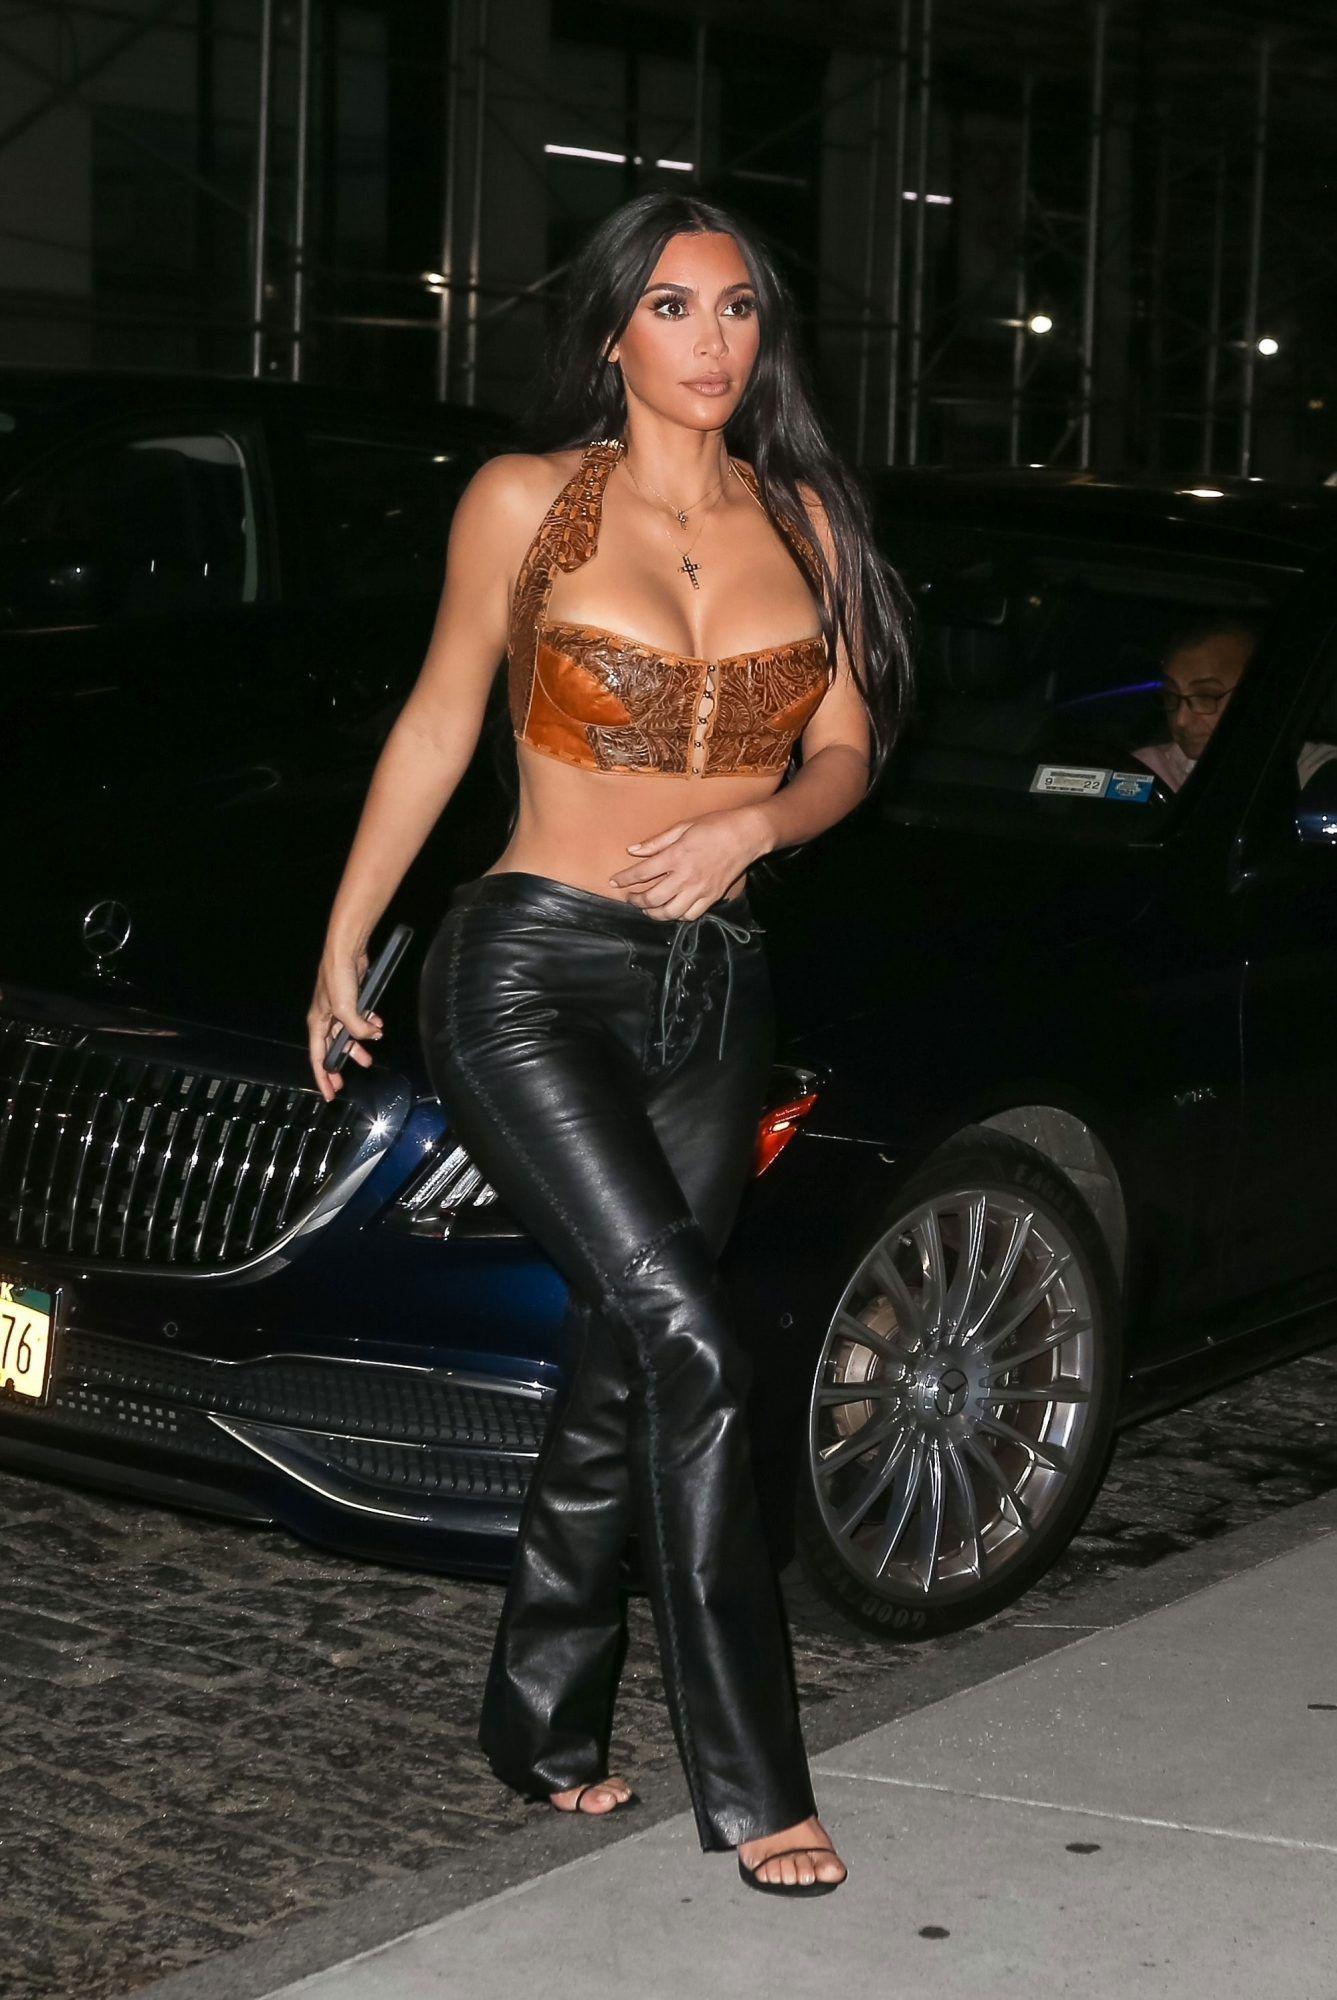 Terlalu Mini! Baju Seksi Kim Kardashian Curi Perhatian Lagi!